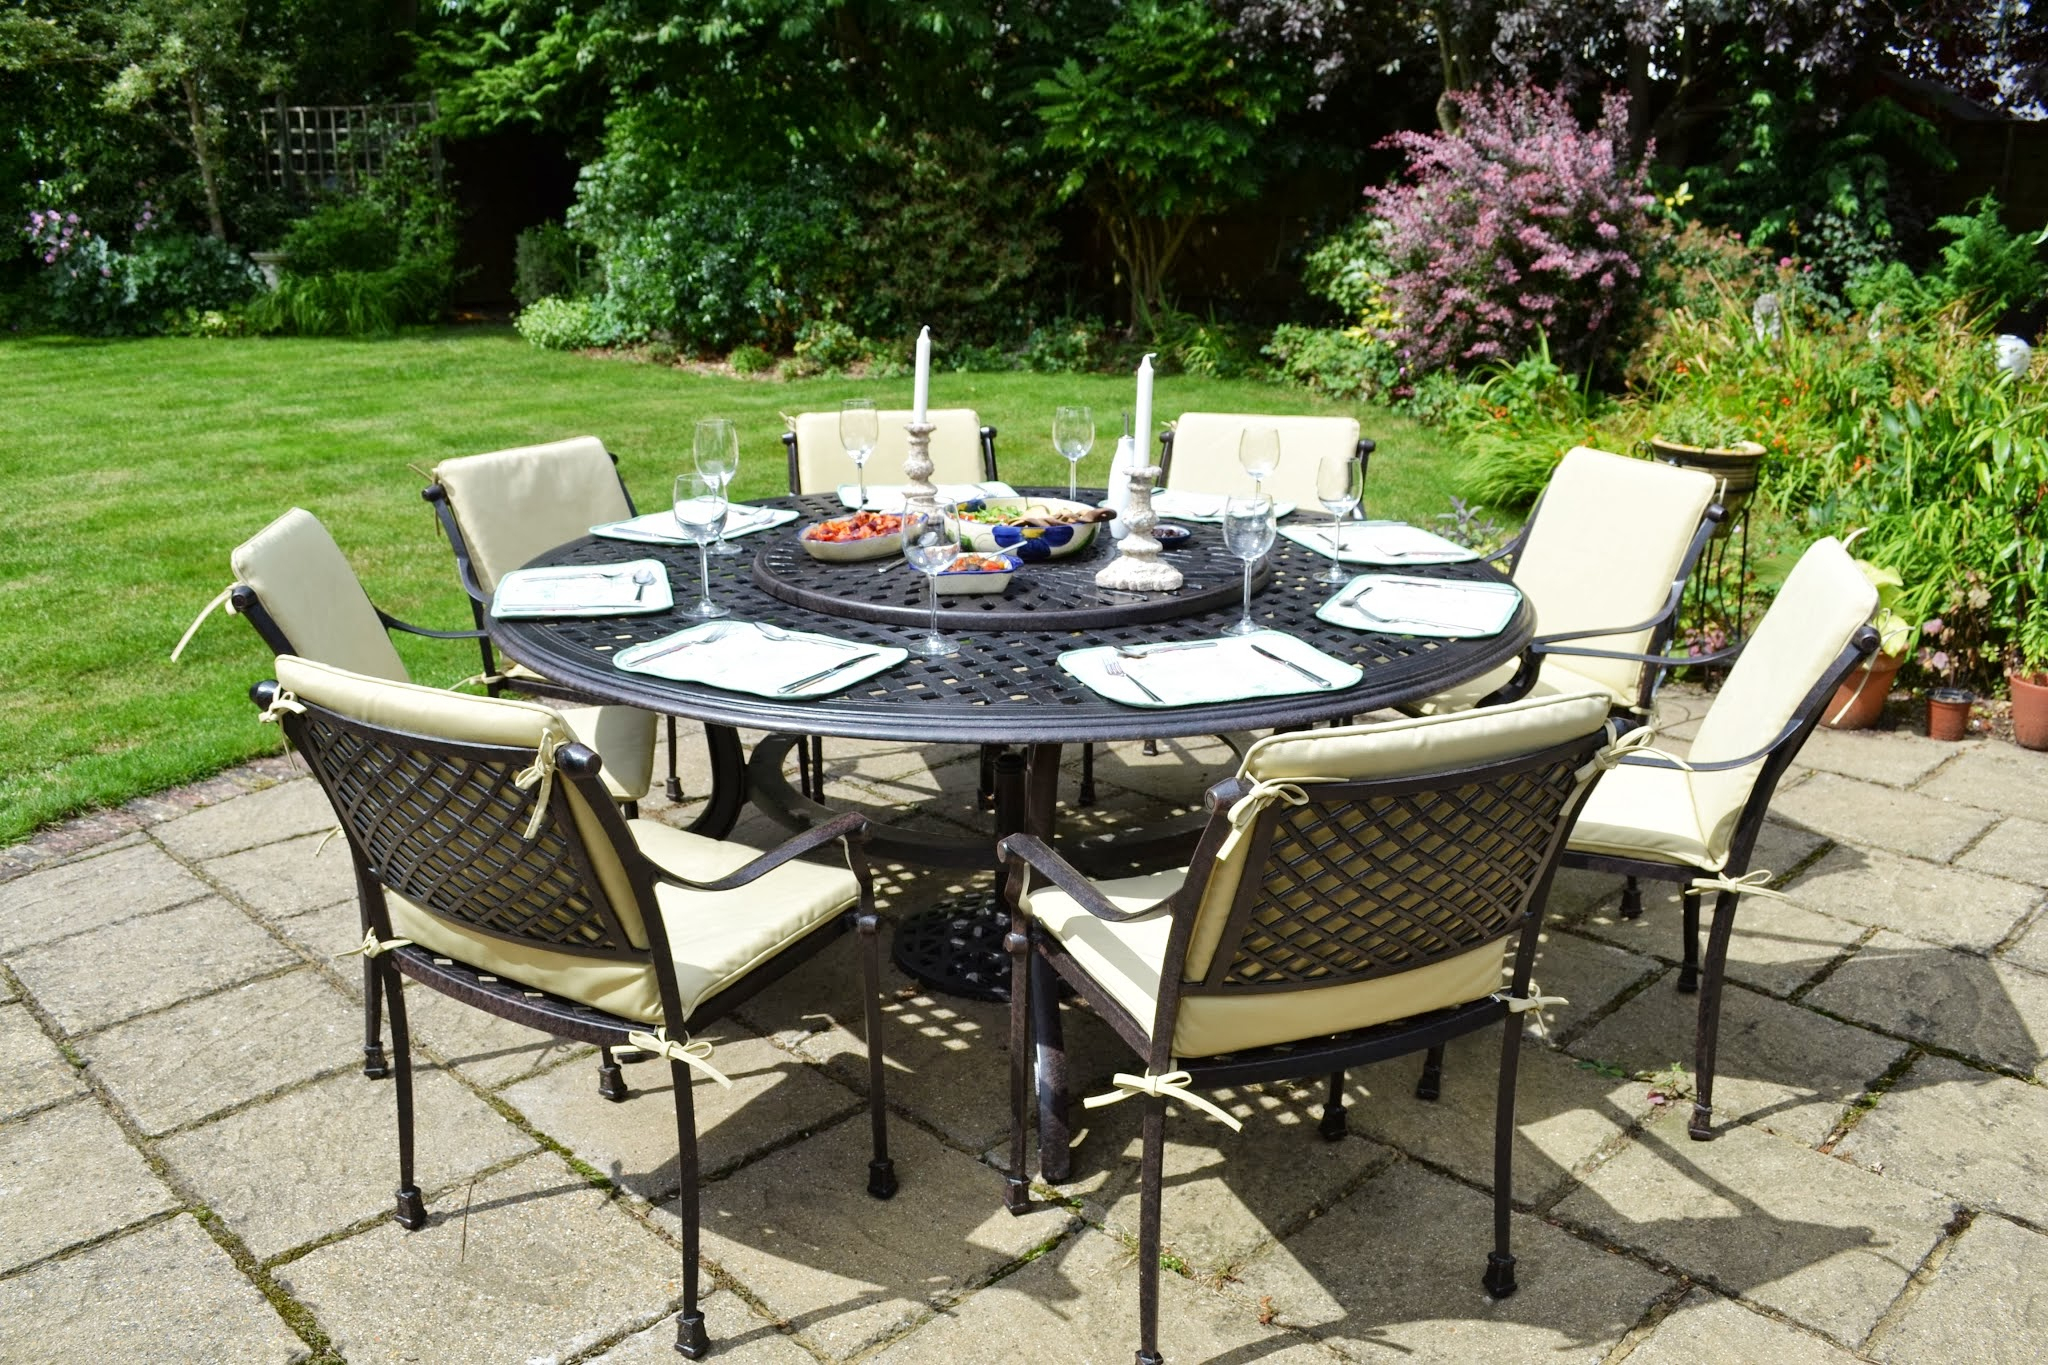 Jardin Table Jardin Tati De Table Tati De R54Laj dedans Banc De Jardin Rond